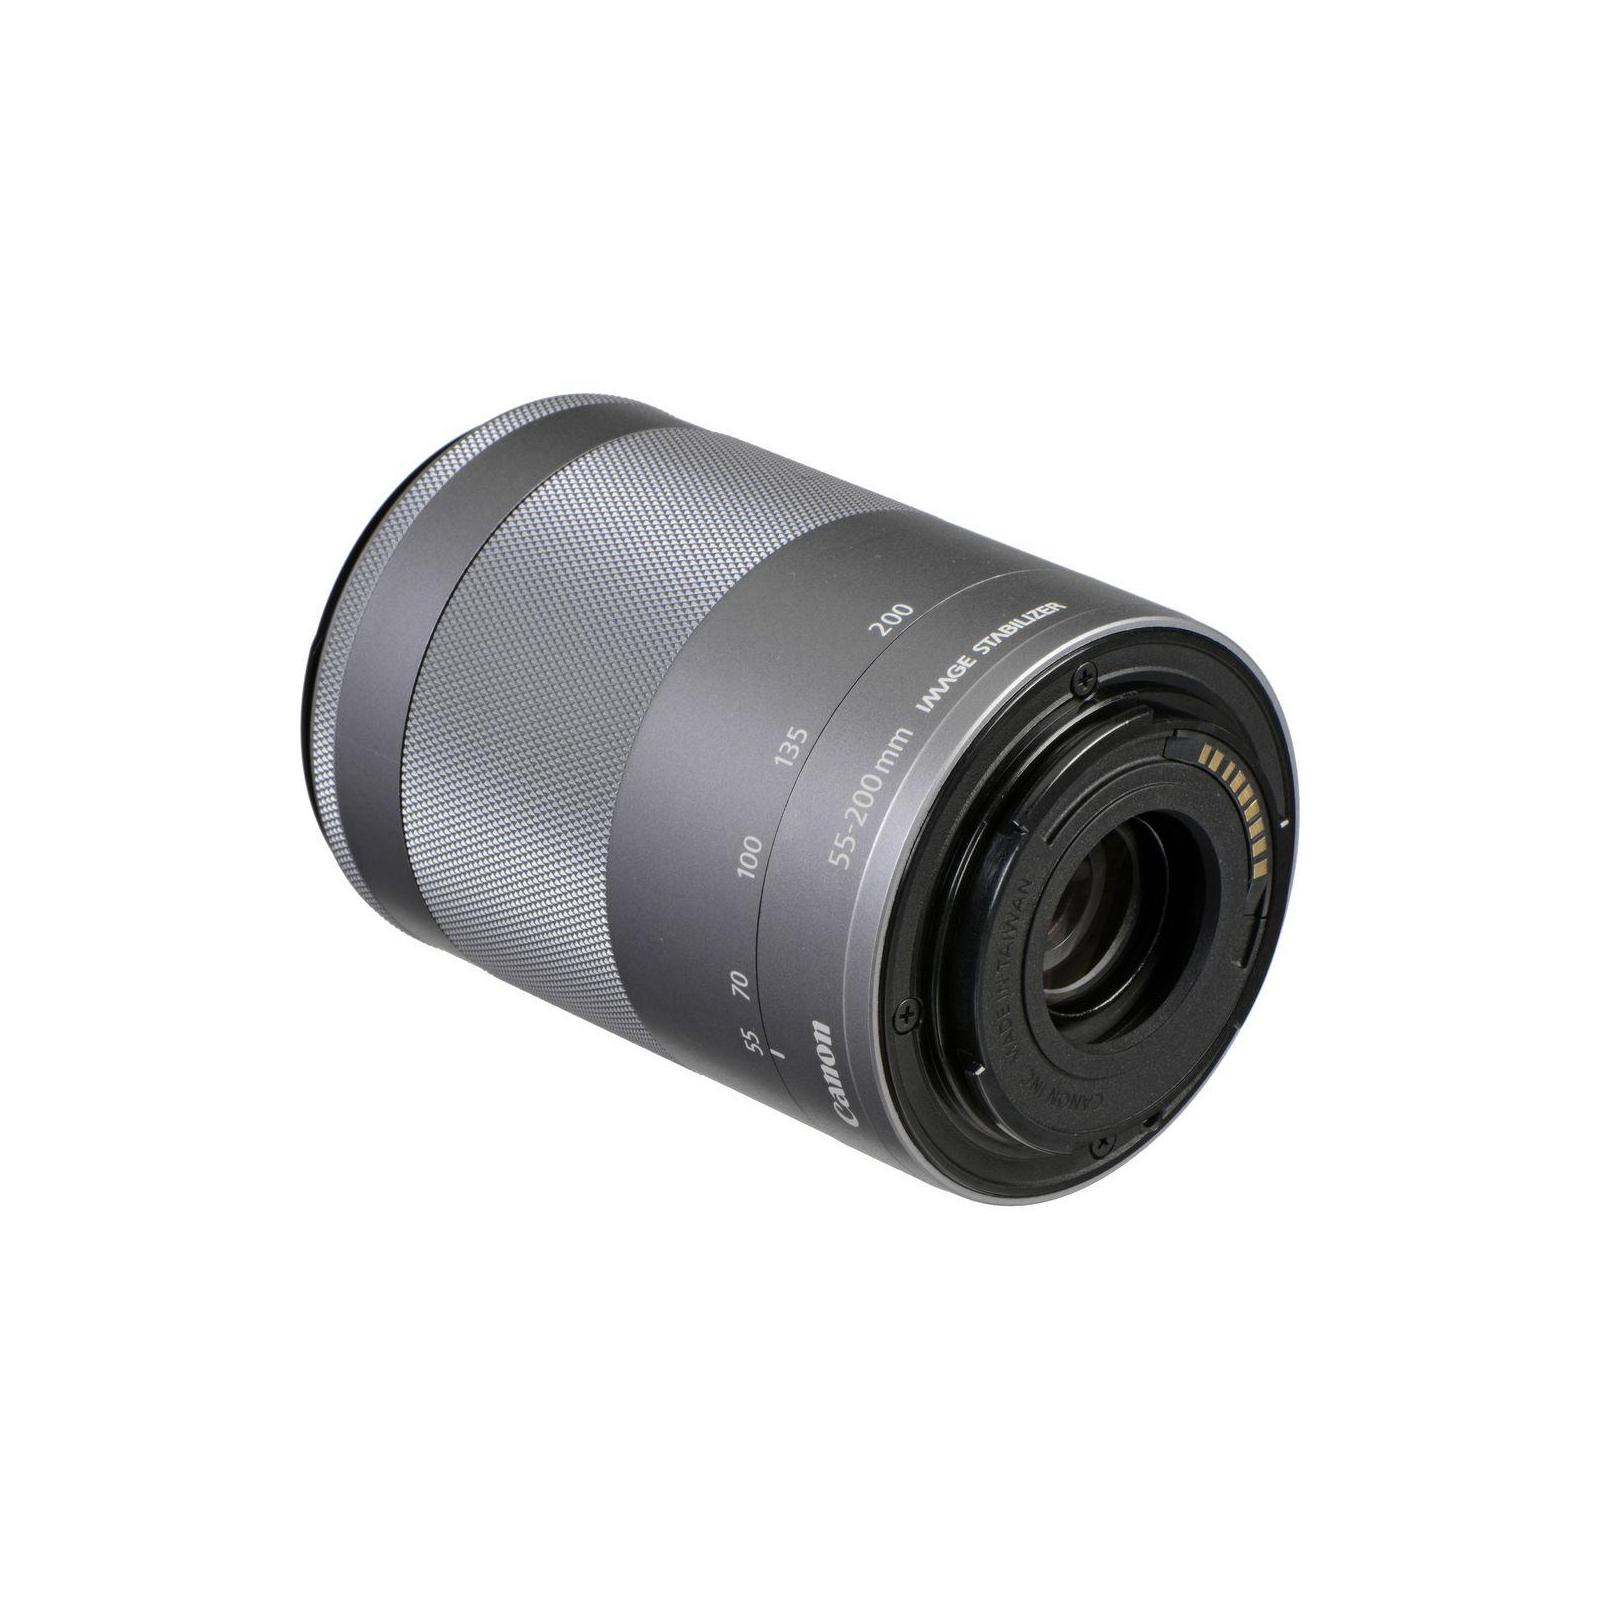 Объектив Canon EF-M 55-200mm f/4.5-6.3 IS STM Silver (1122C005) изображение 4